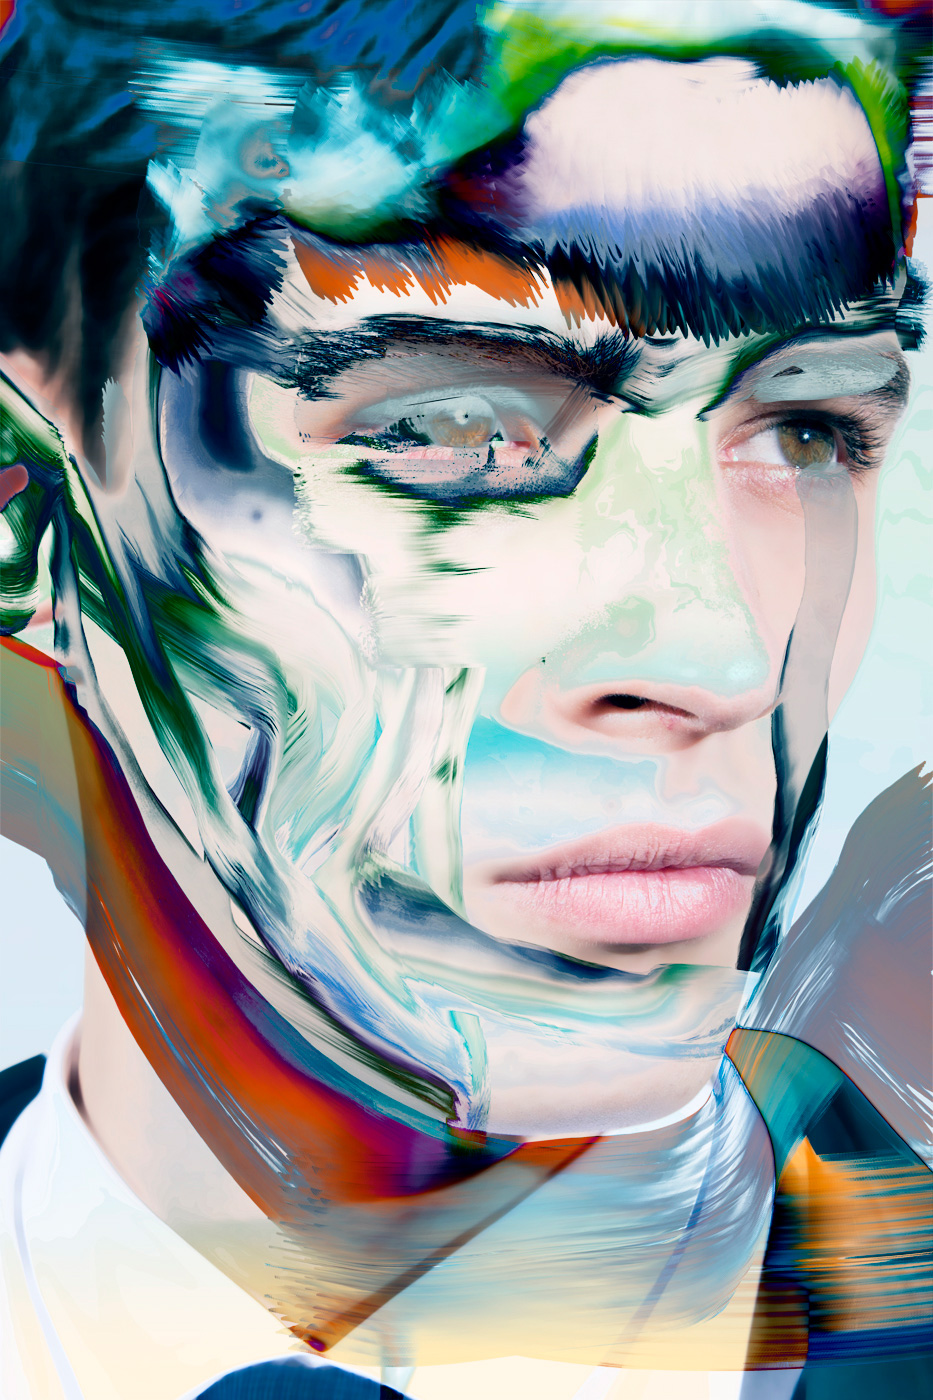 Hypnotic Double Exposure Portraits, Pierre Debusschere | Yellowtrace